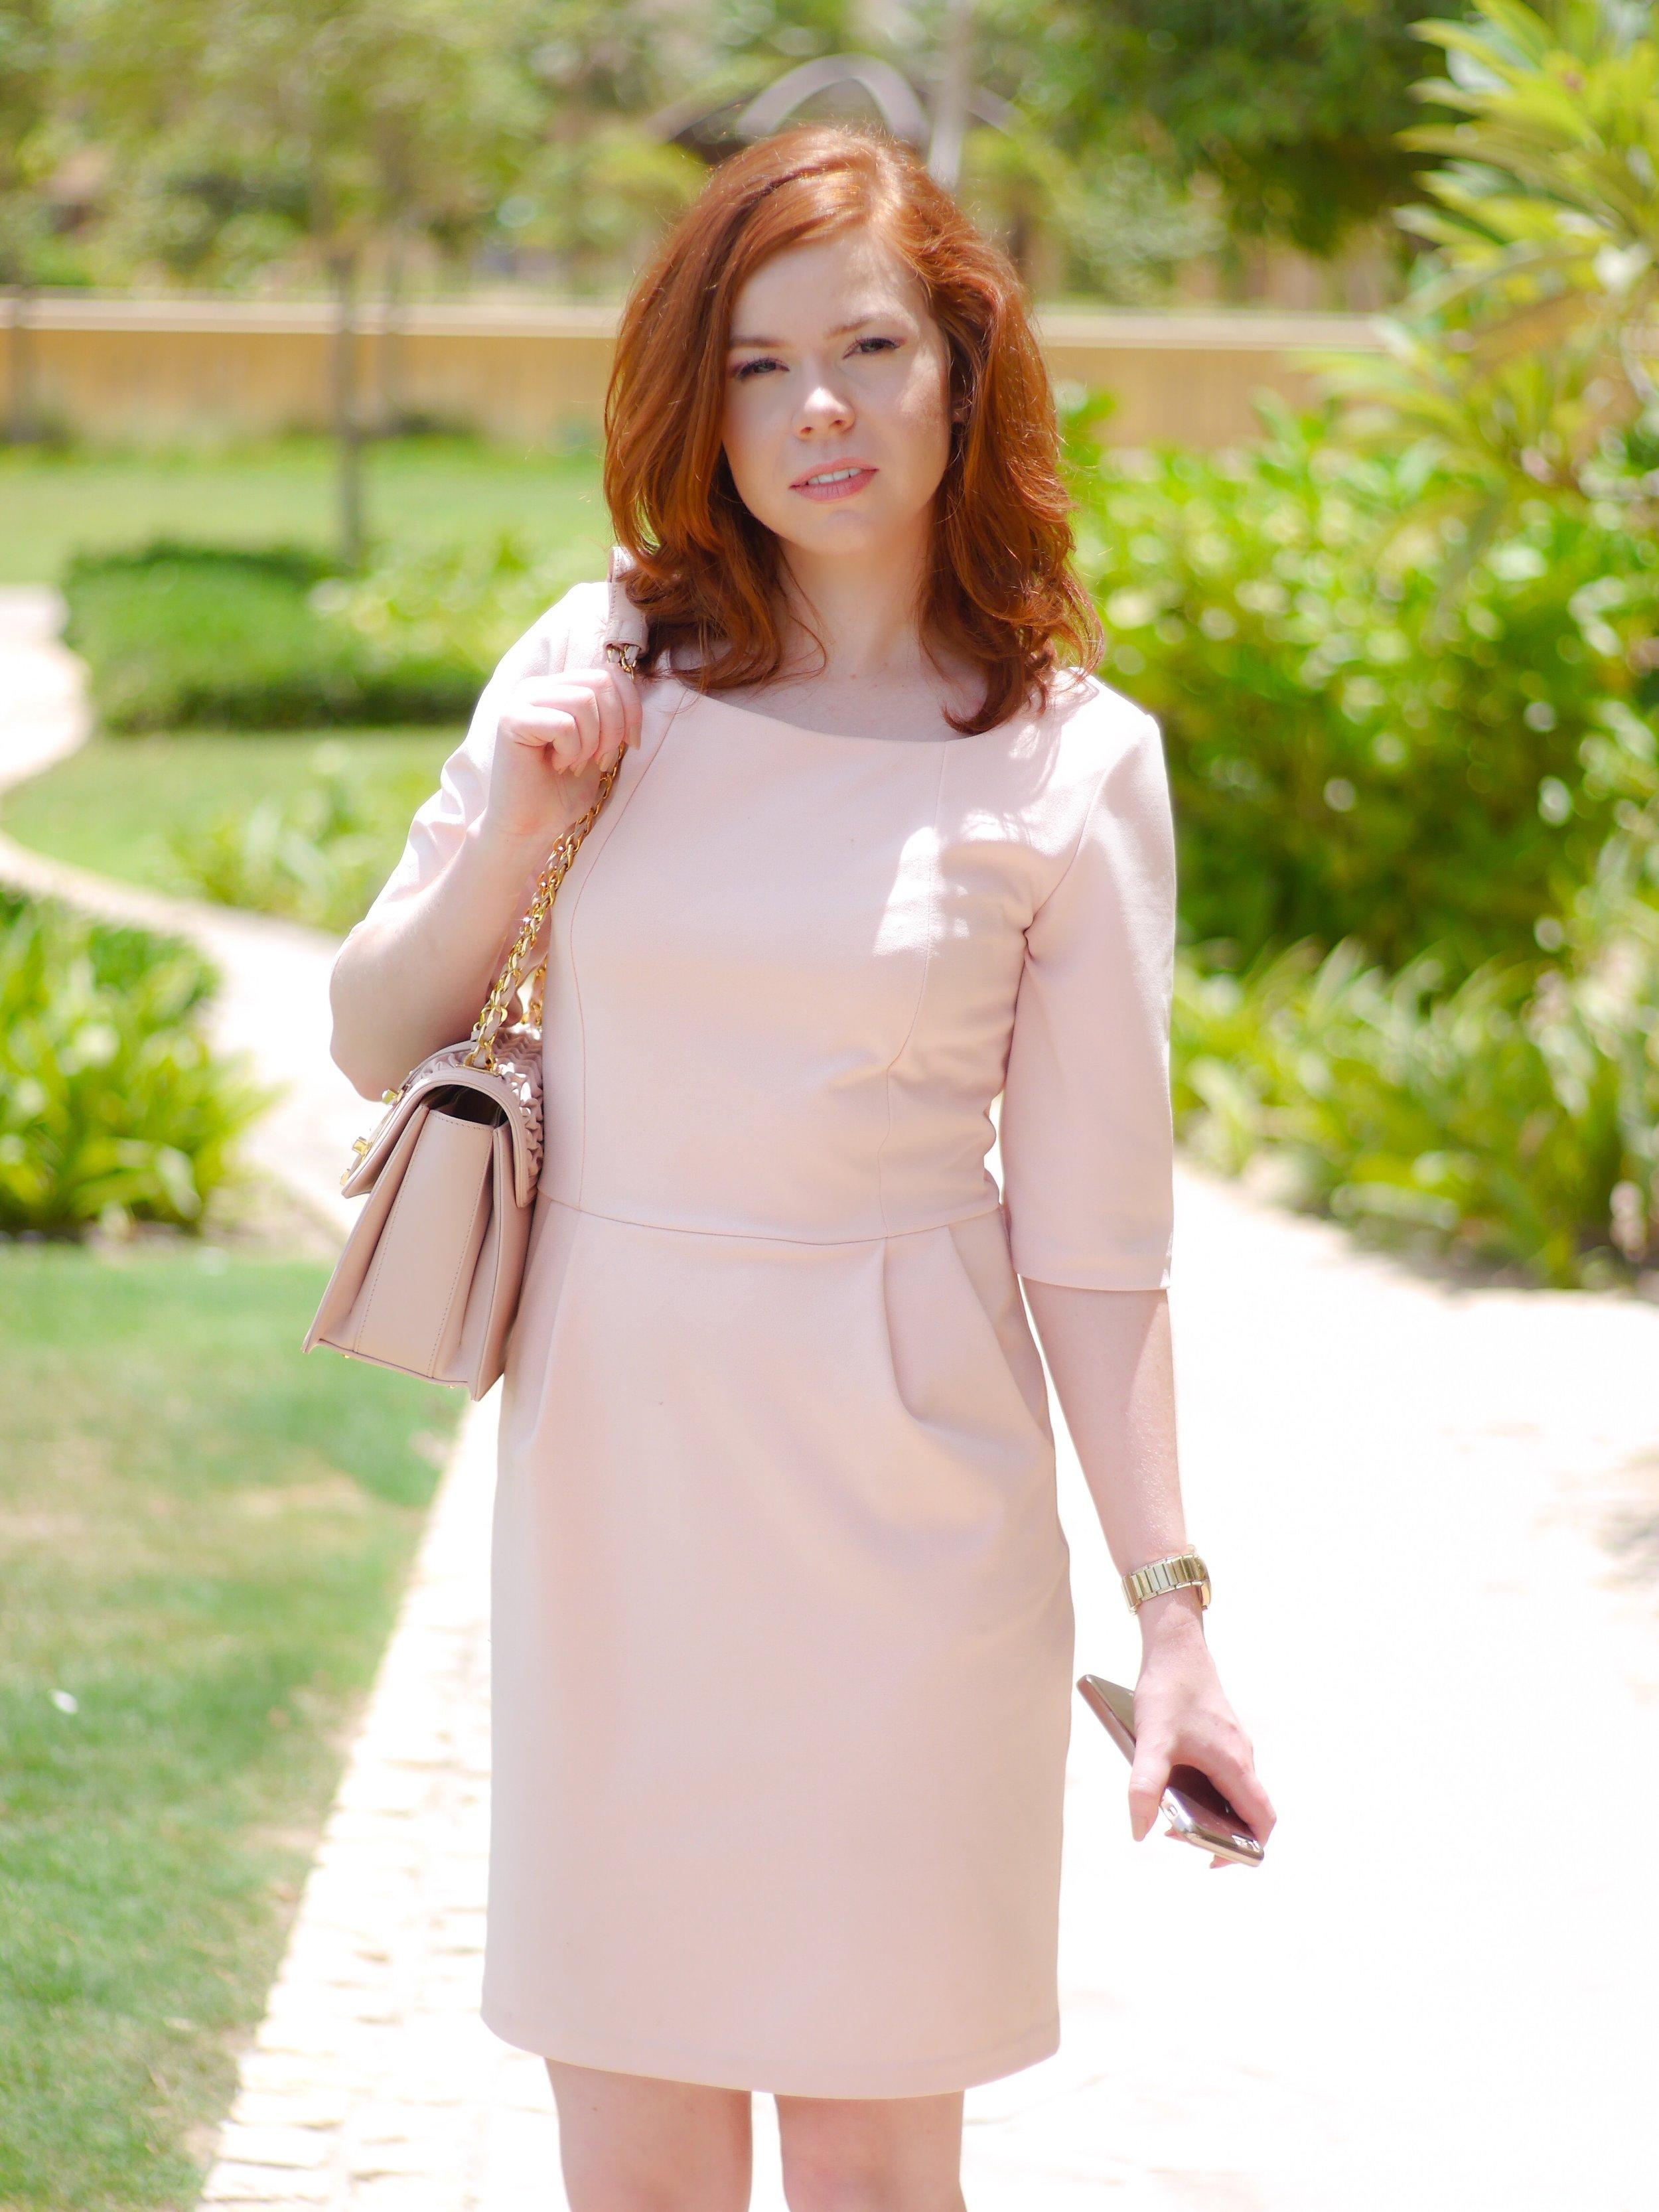 pink dress office fashion - briar prestidge - deals in high heels